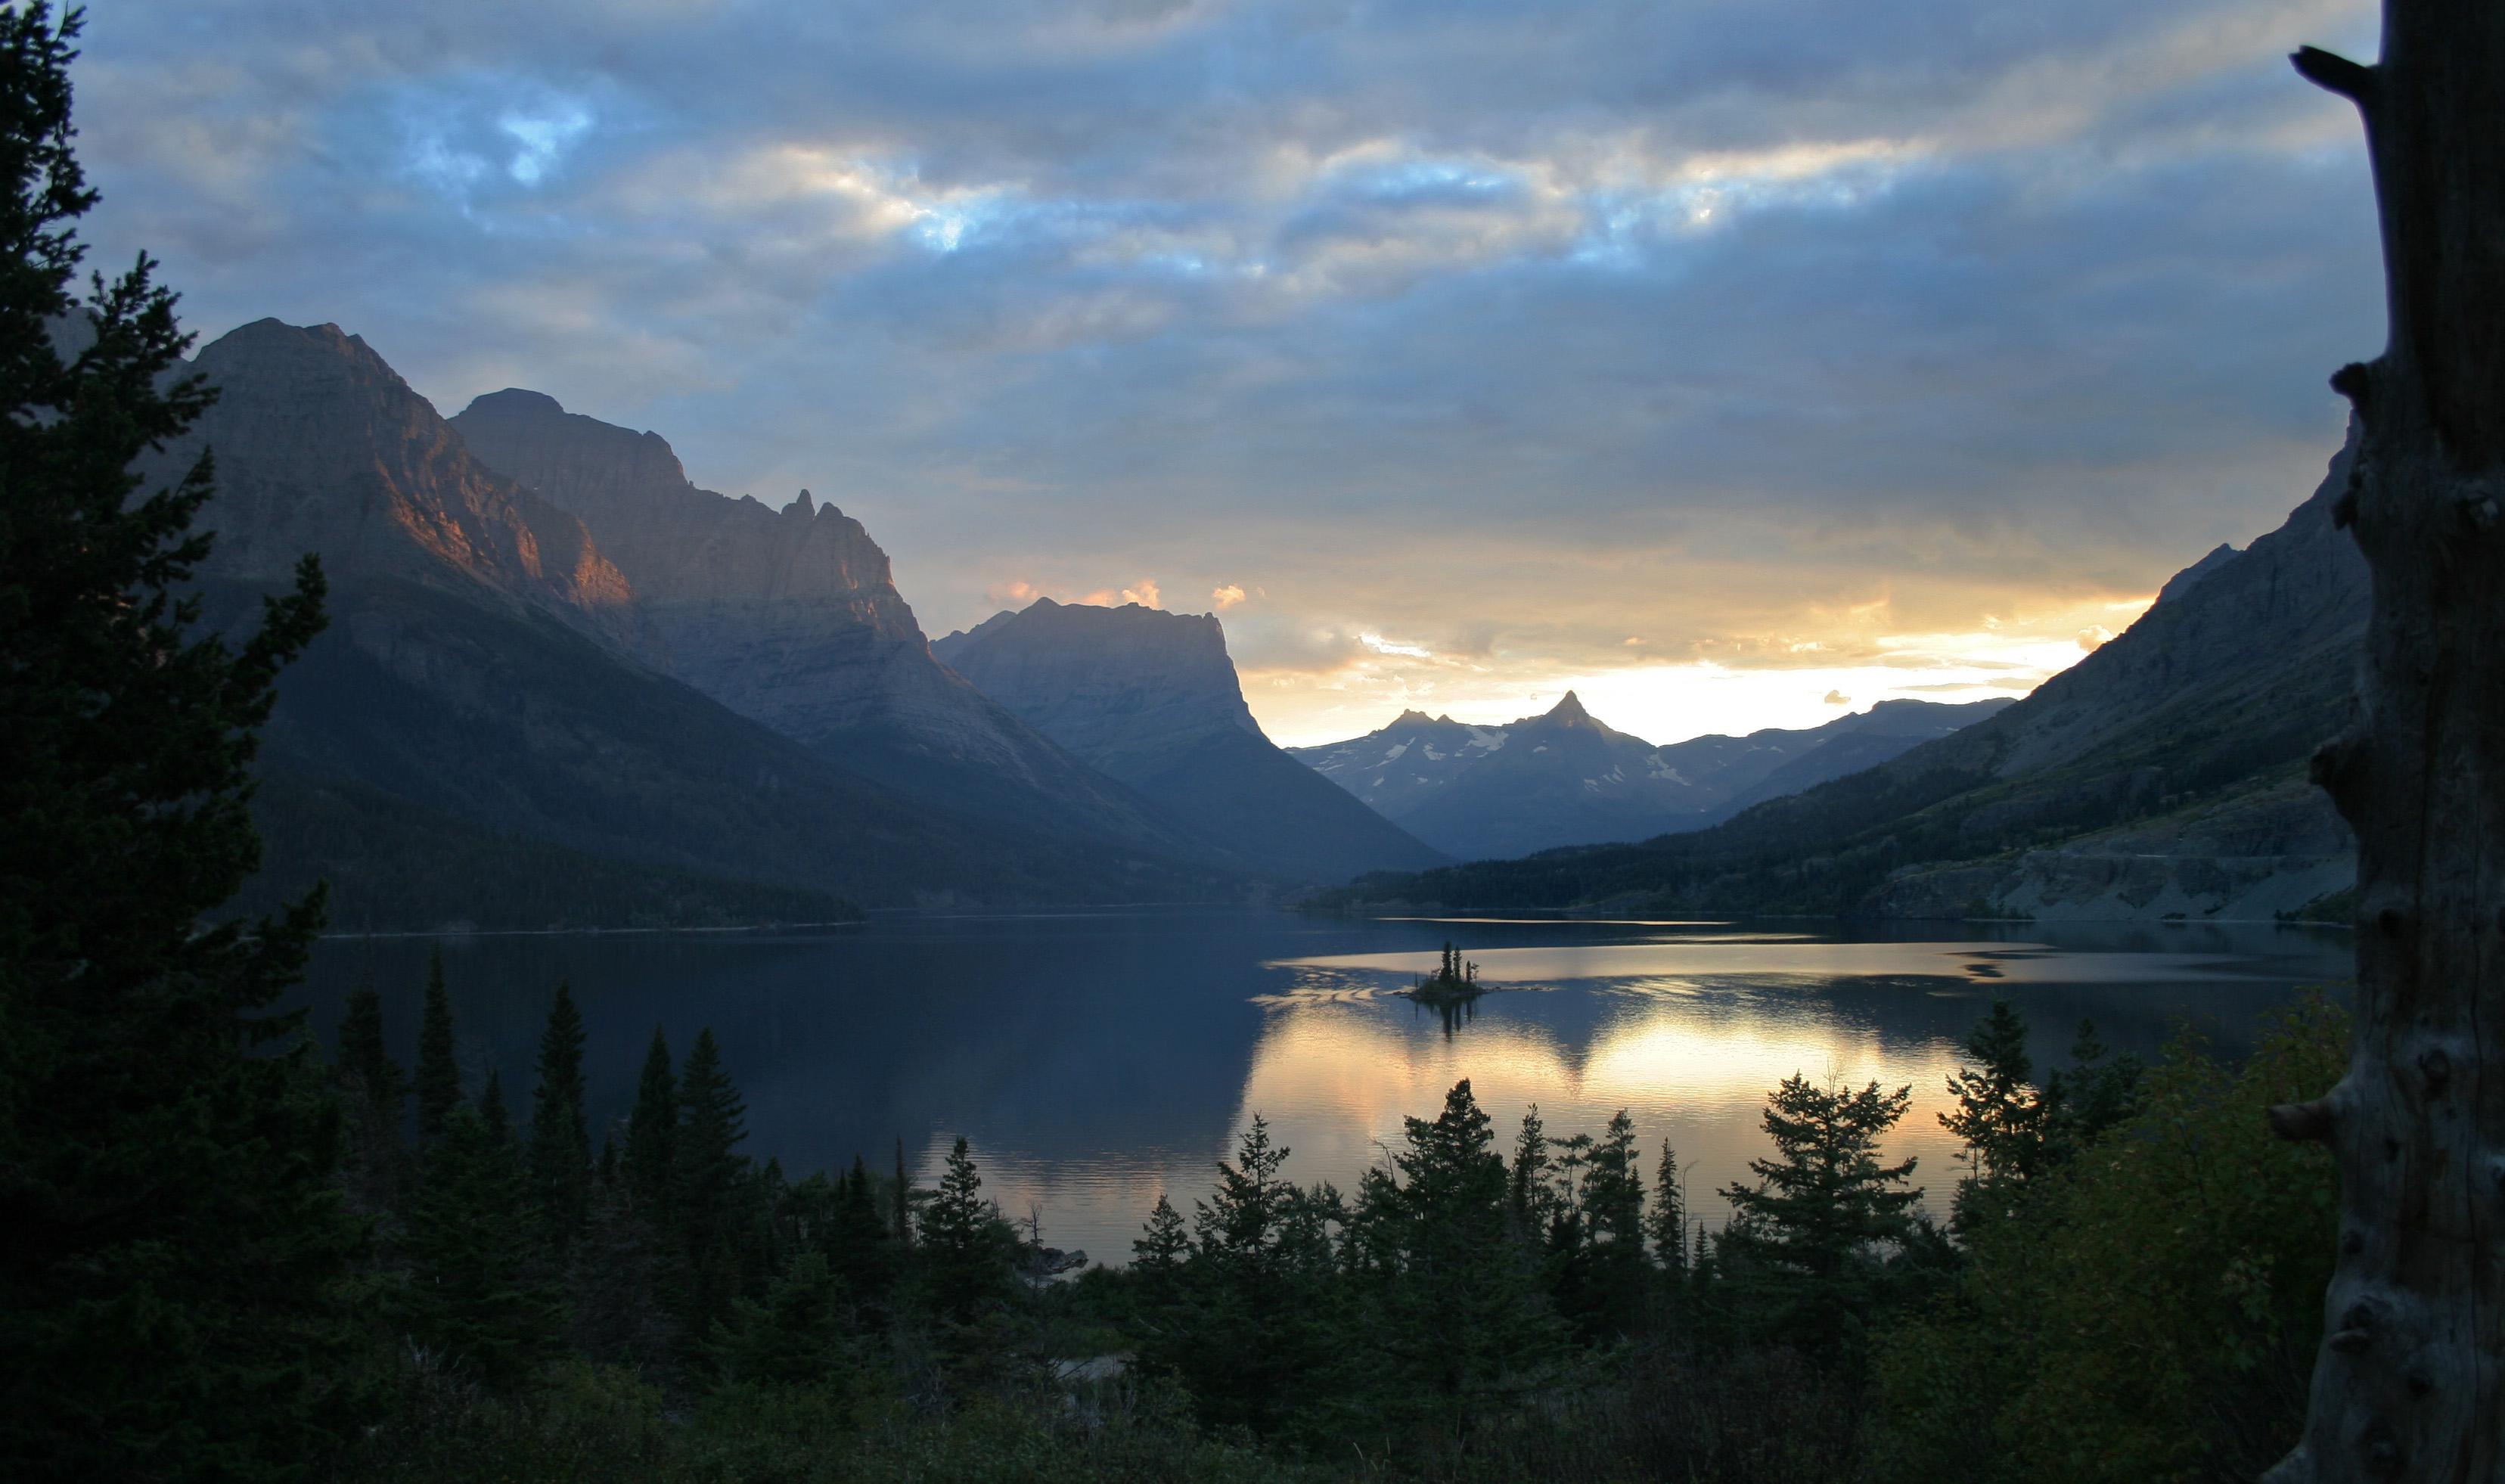 glacier national park photo - photo #29